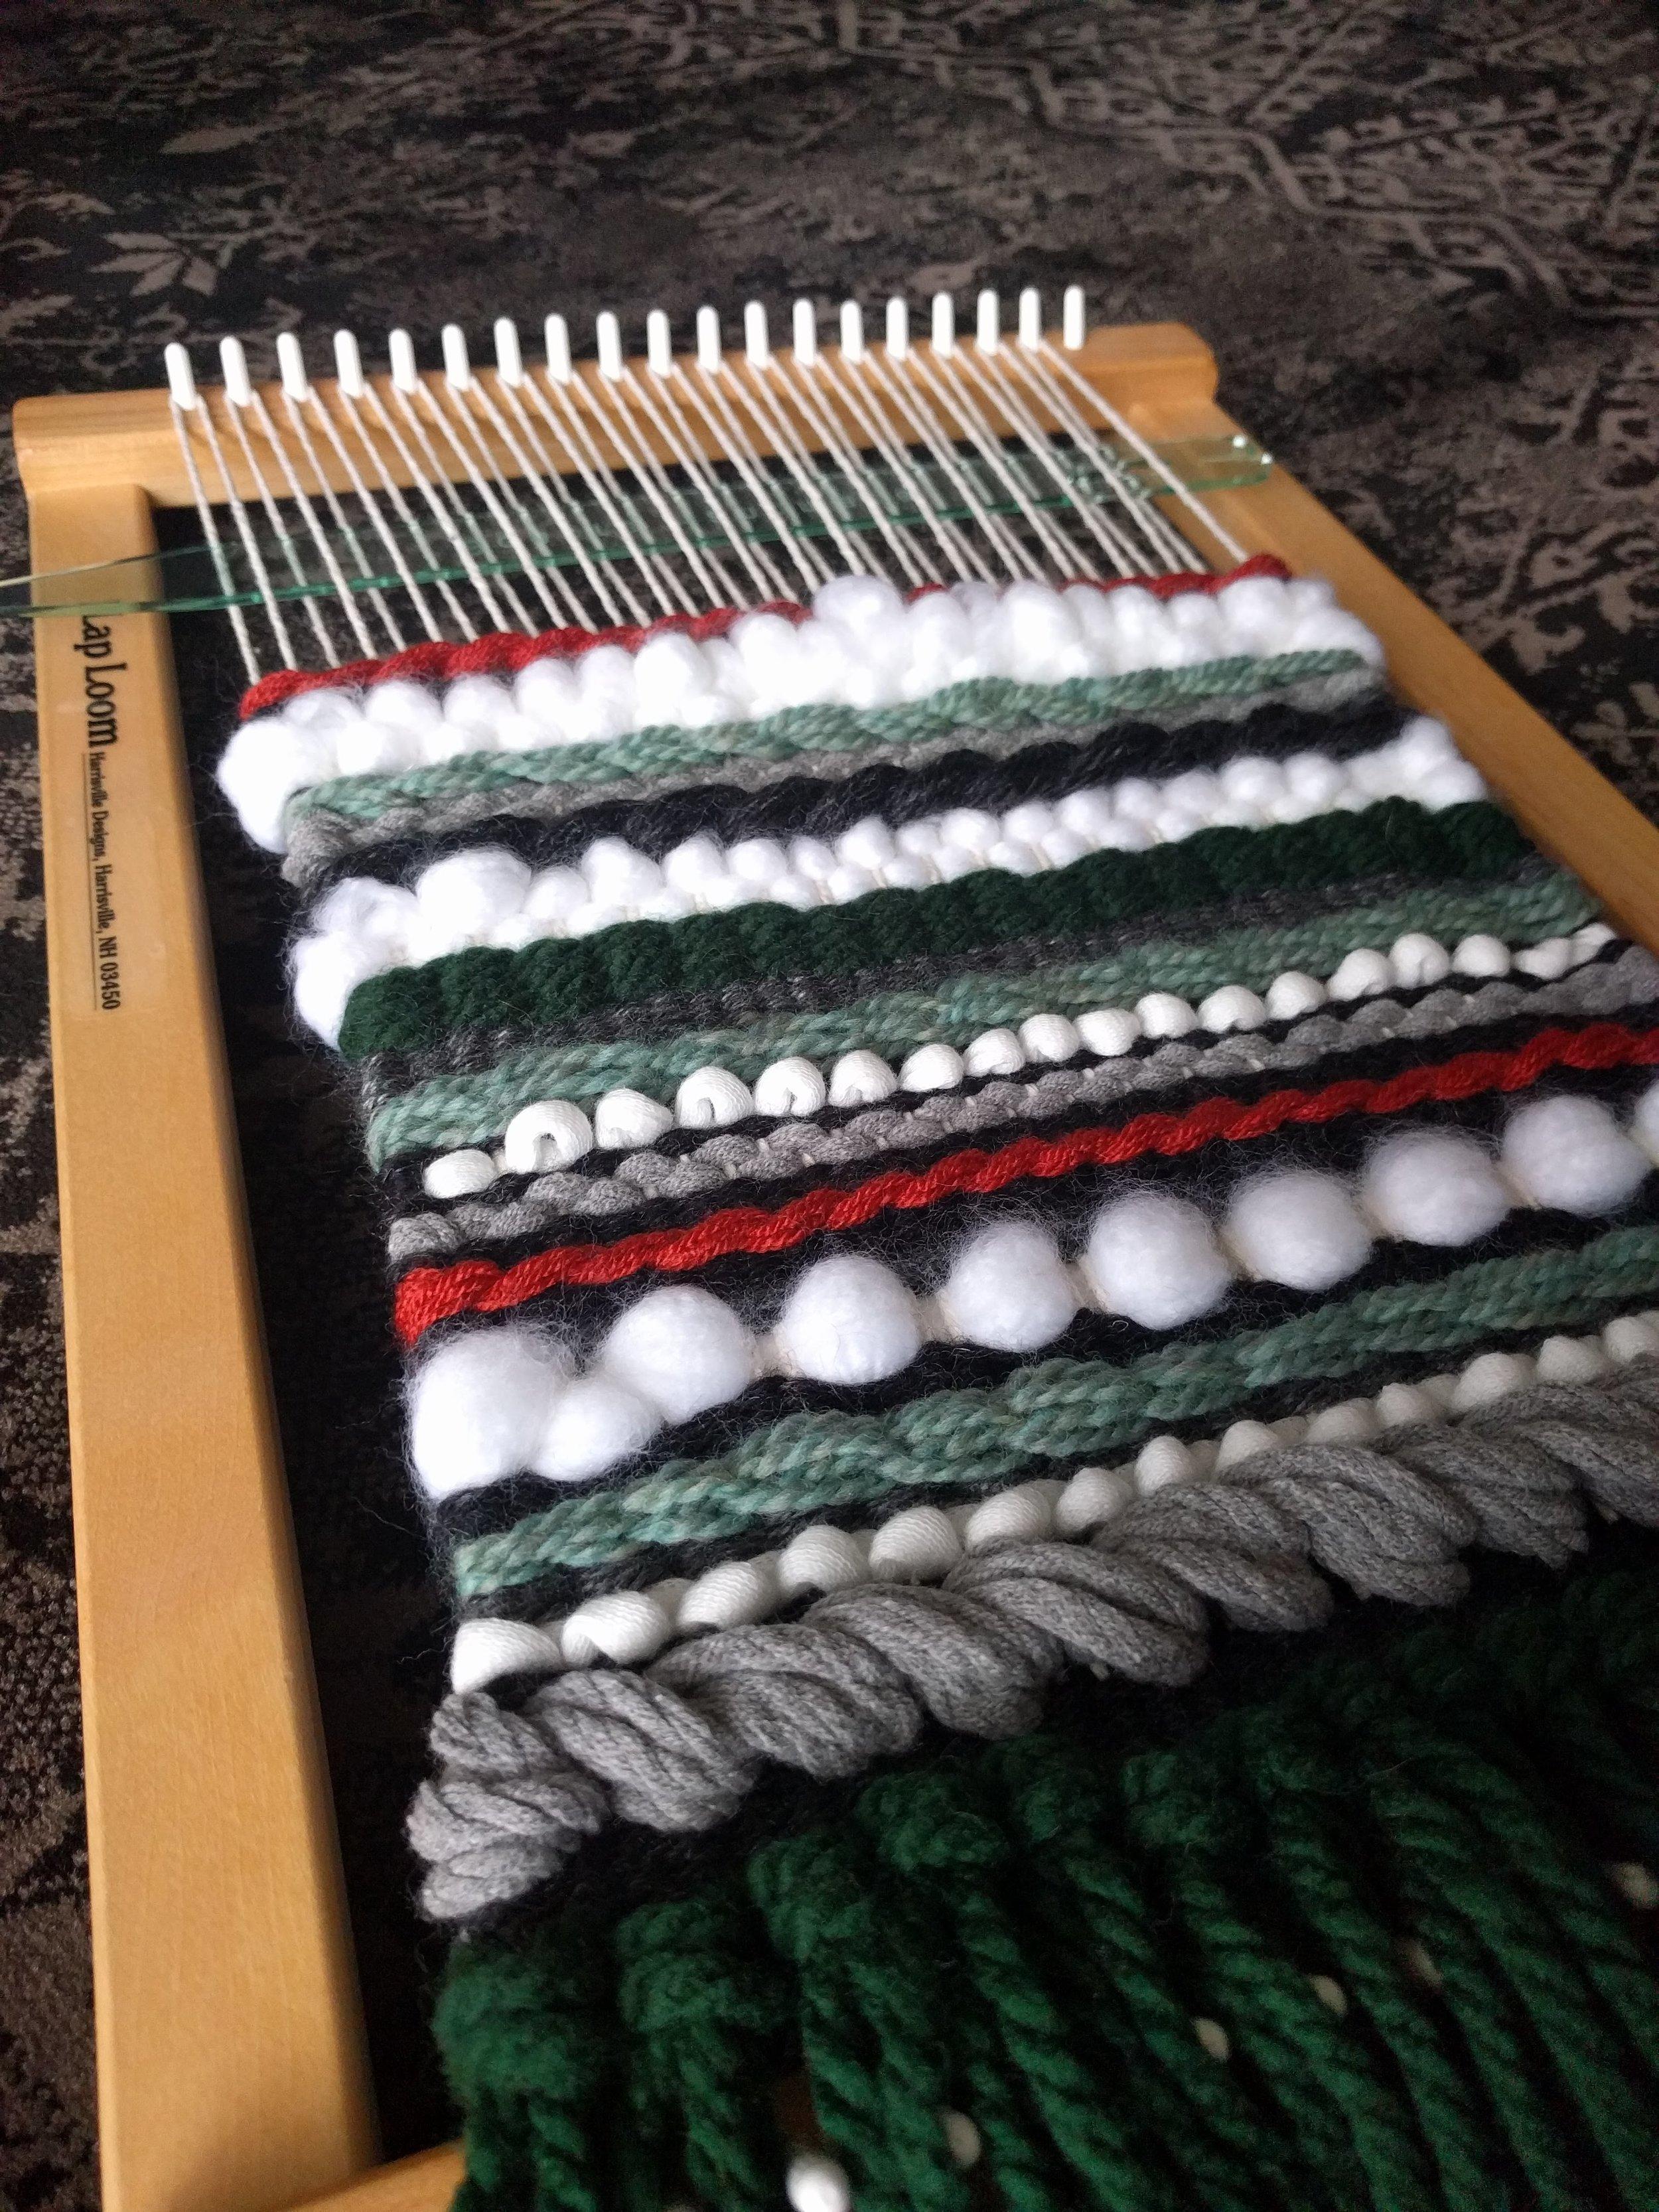 Weaving hobby progress - brianakapper.com